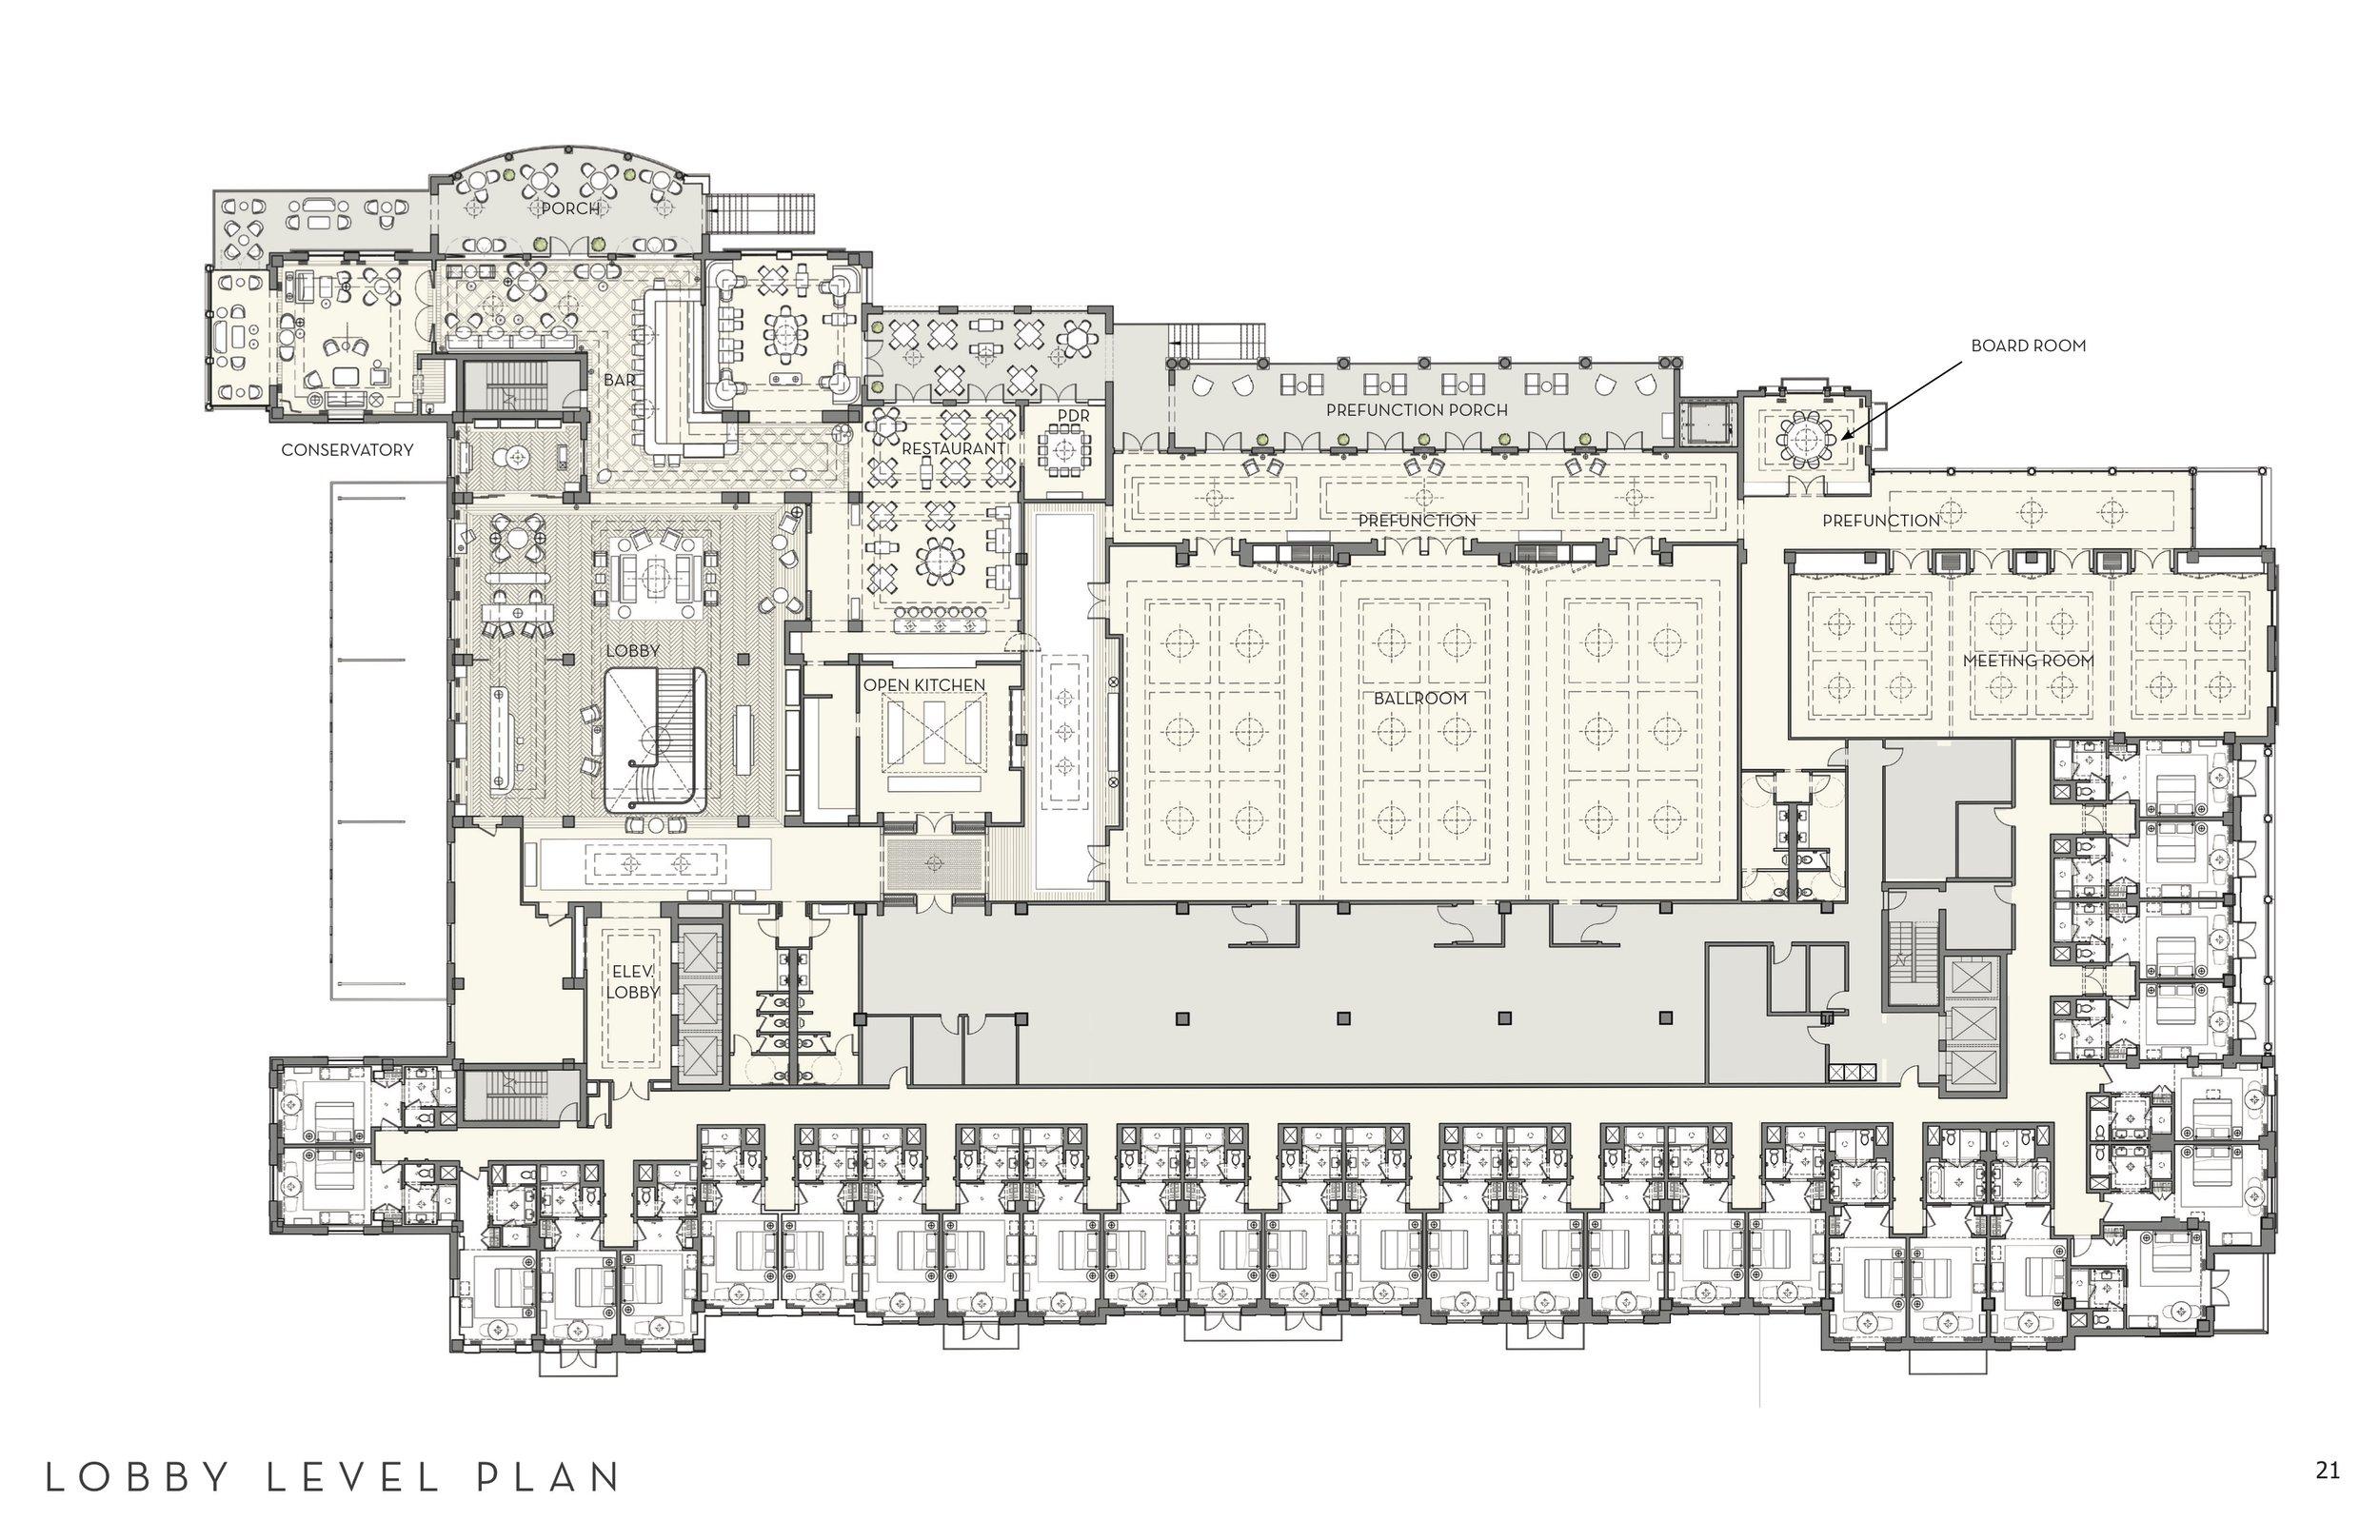 charleston hotel lobby plan.jpg